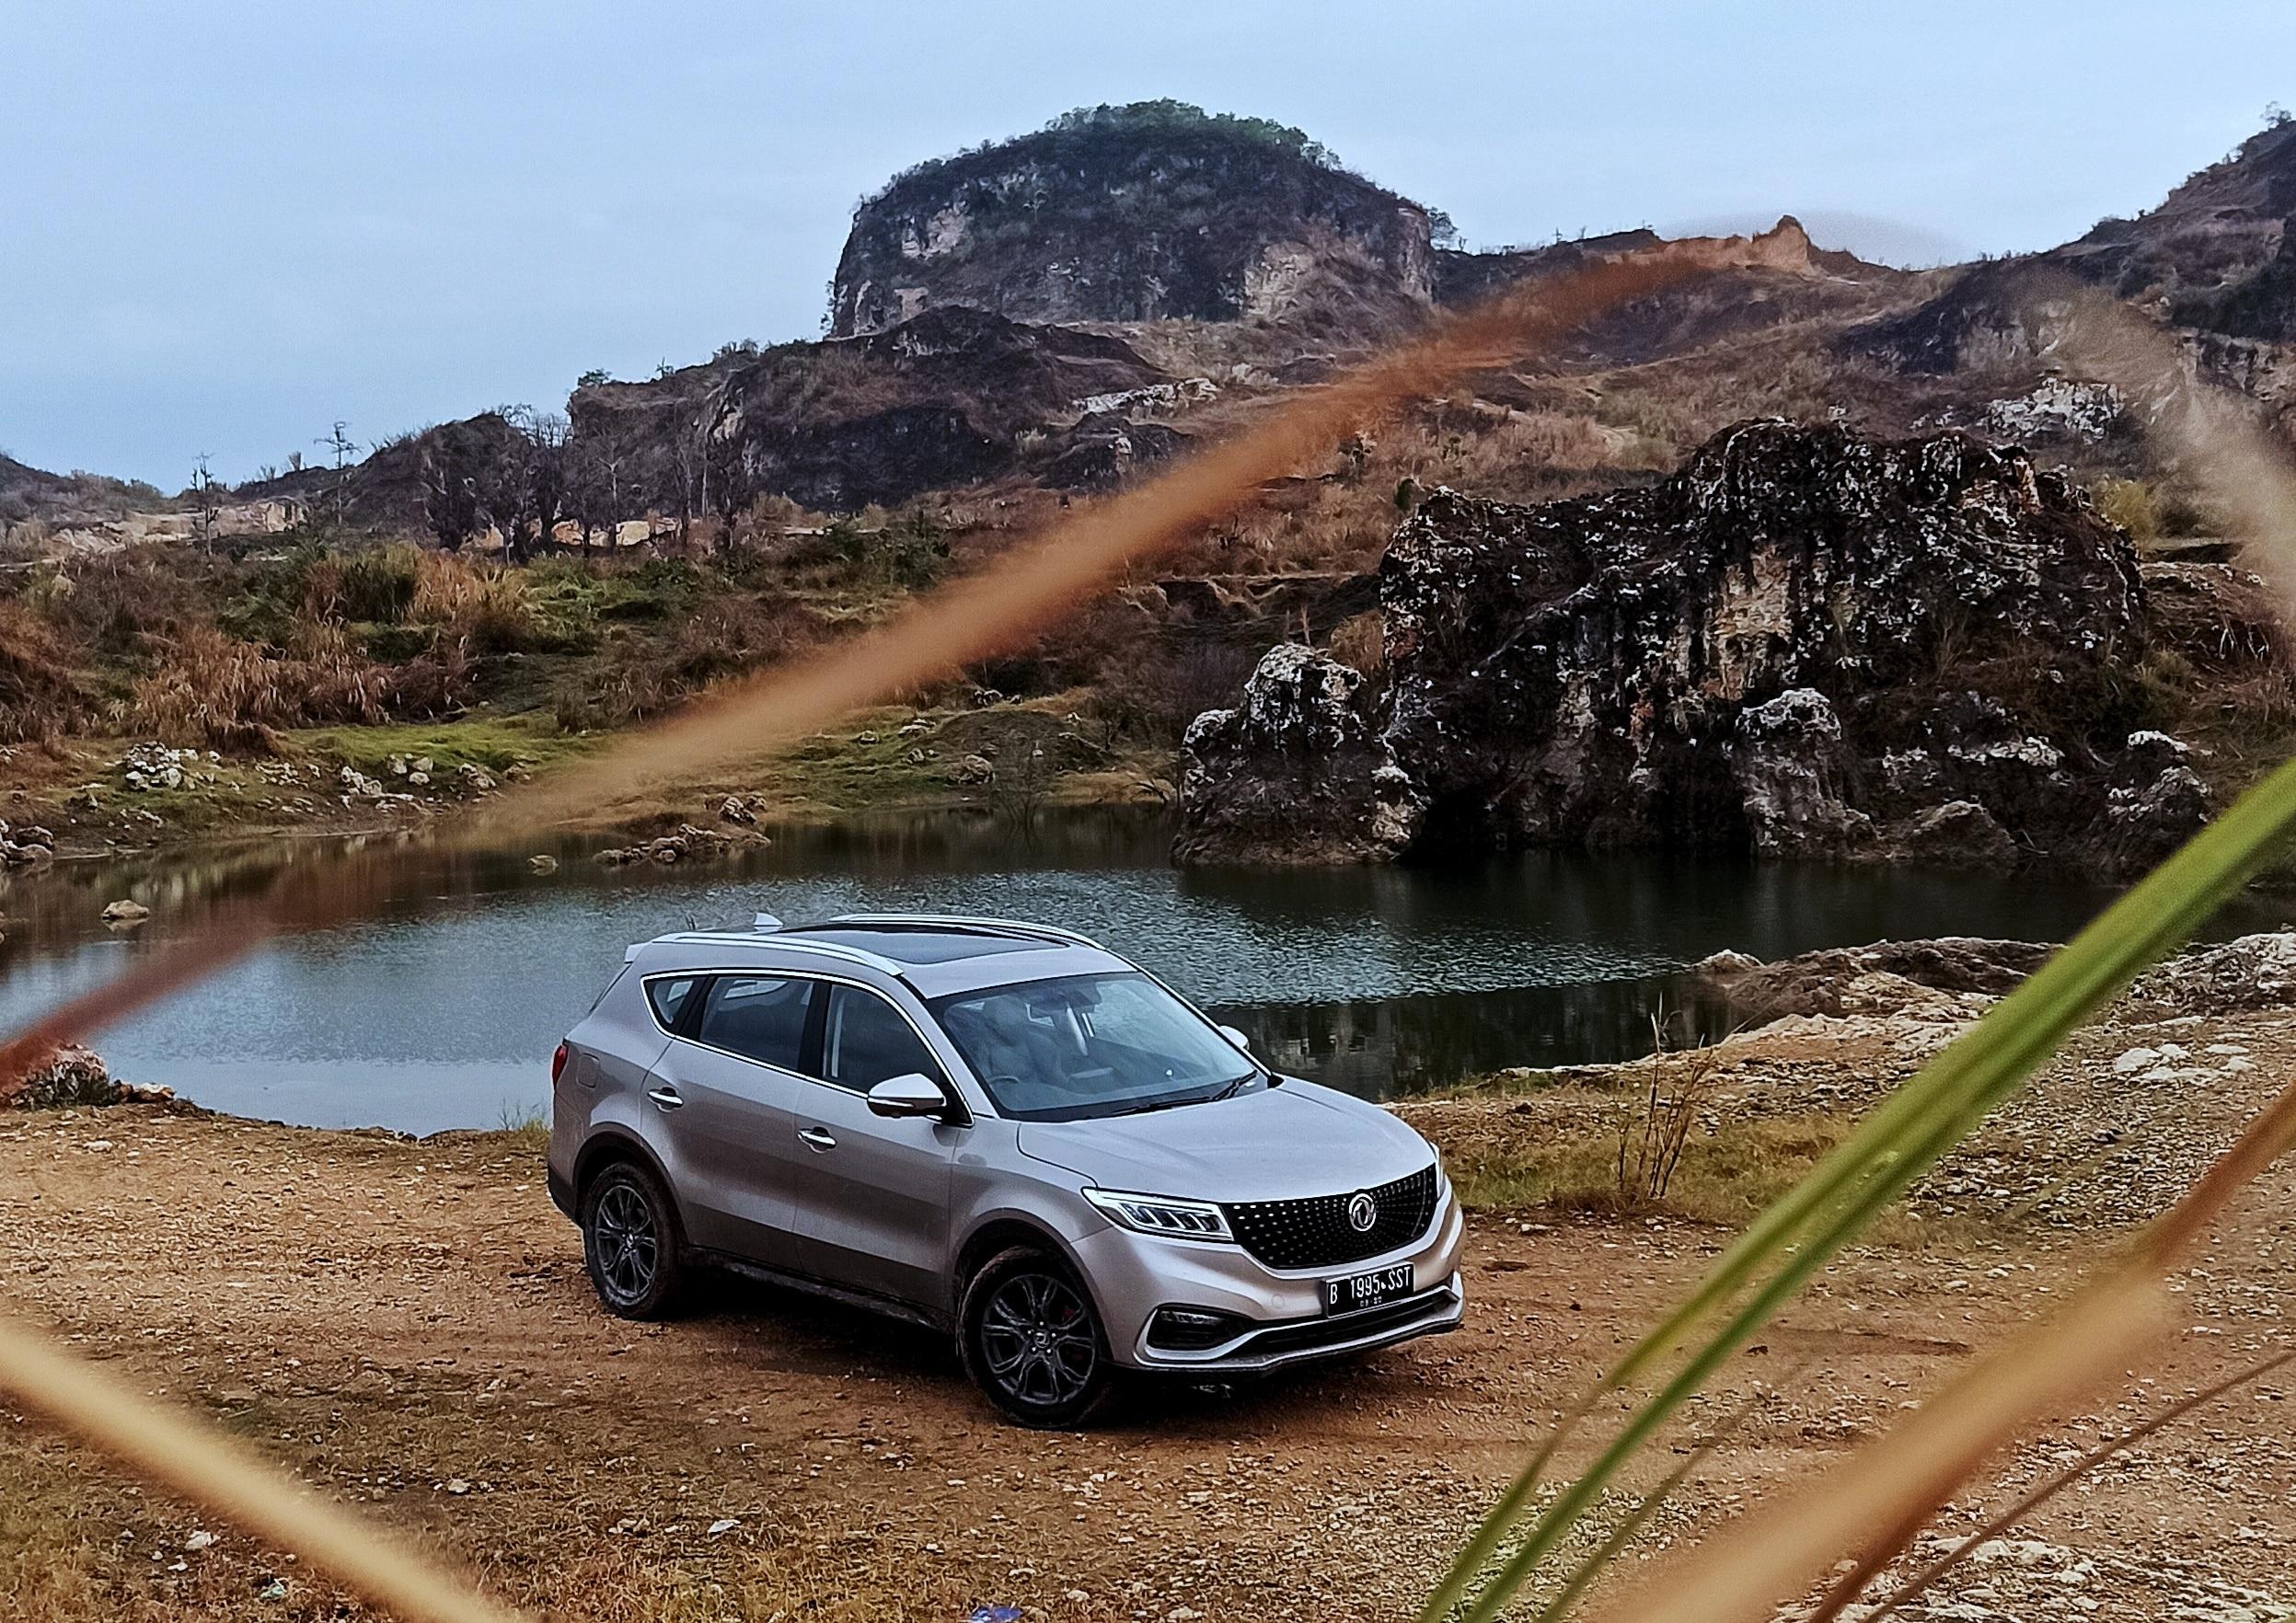 TEST DRIVE: 700 Km Bersama DFSK Glory i-Auto (Bagian 1)